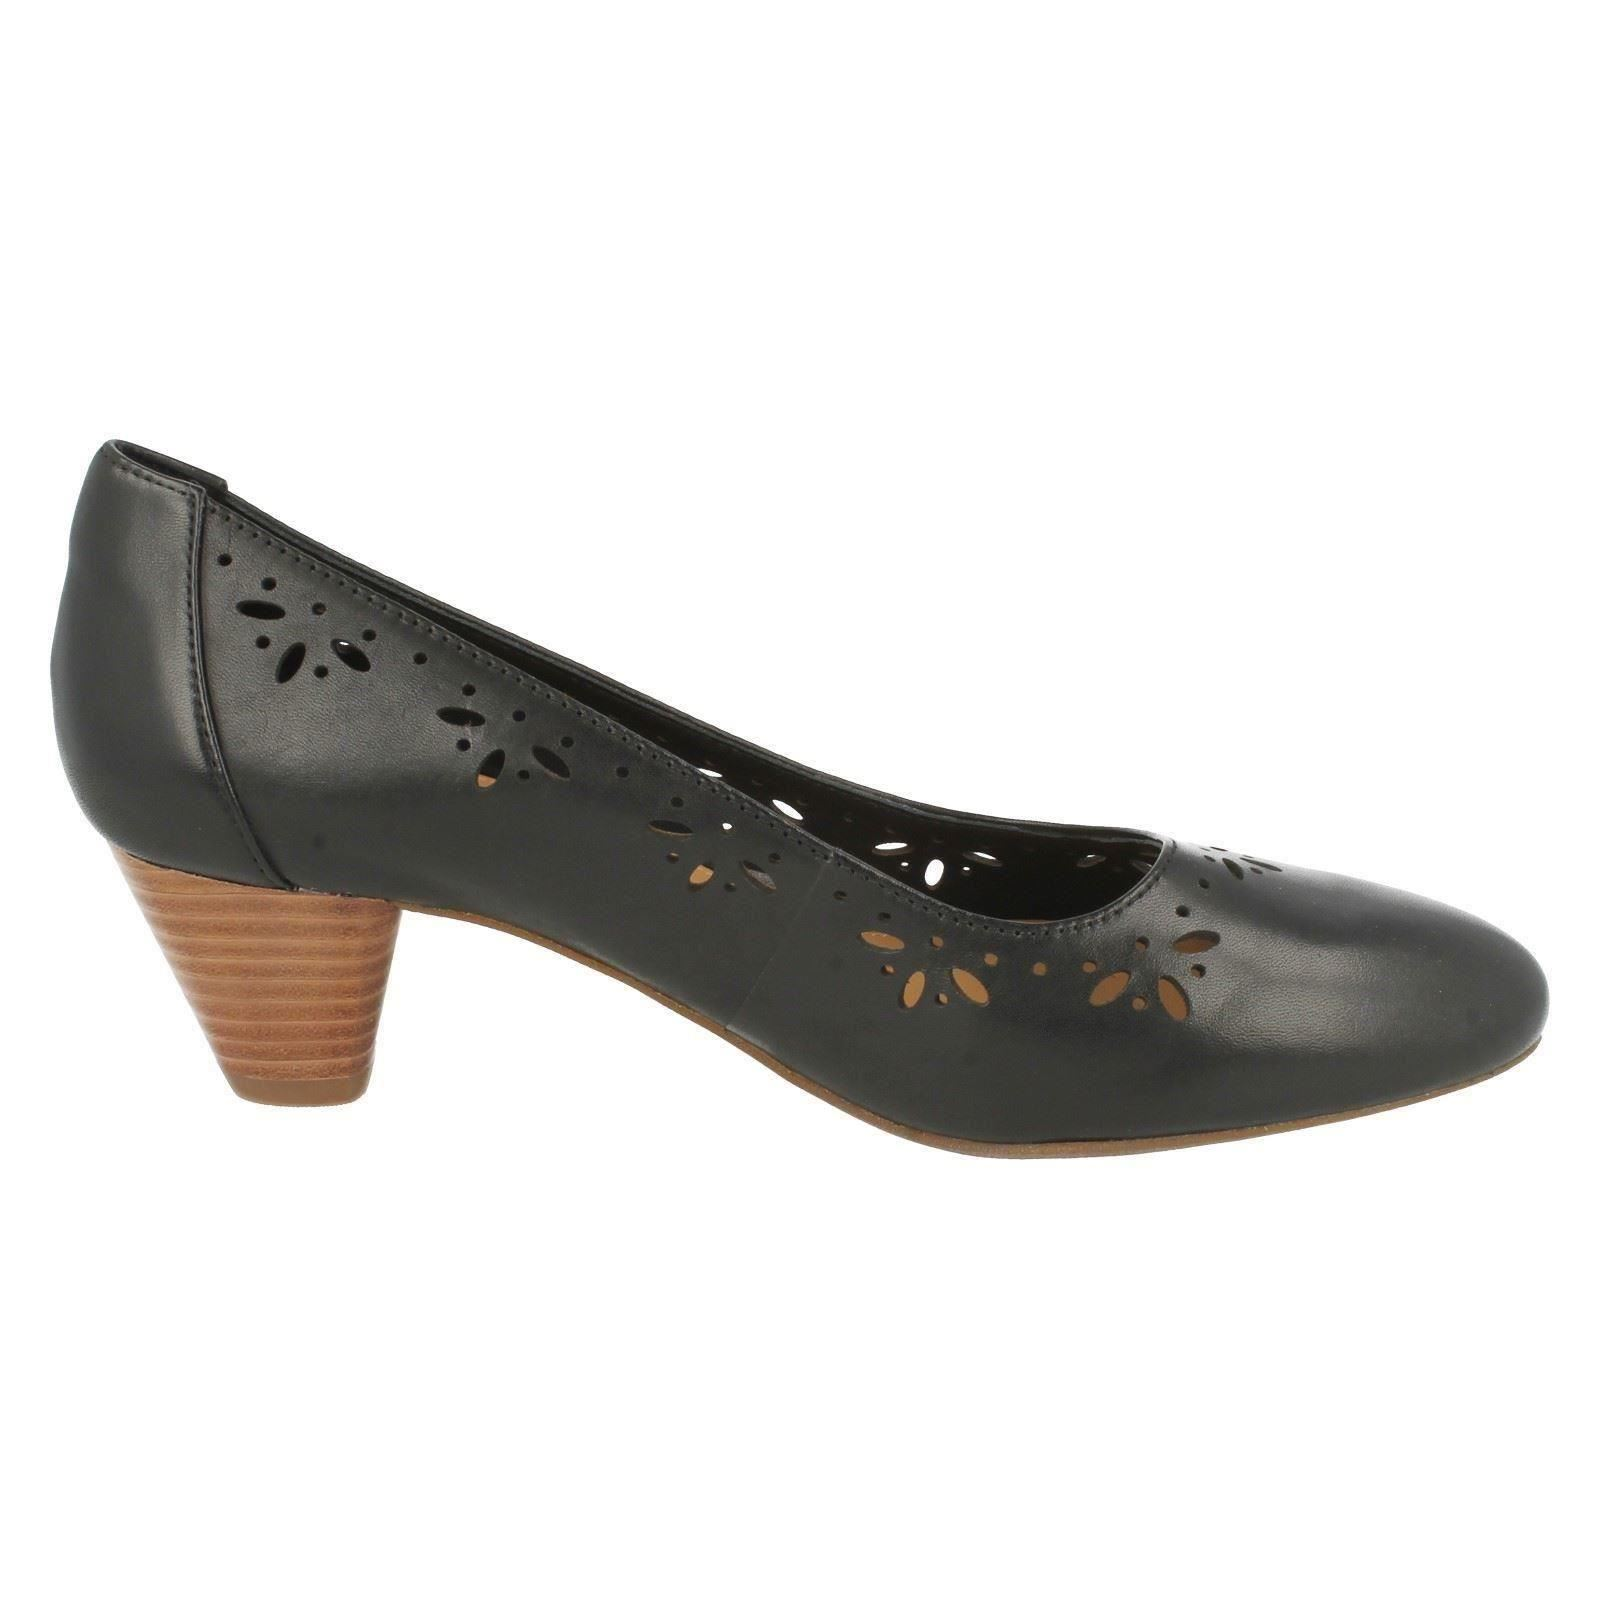 "Ladies Clarks Low Heeled Court Shoes /""Denny Dazzle/"""